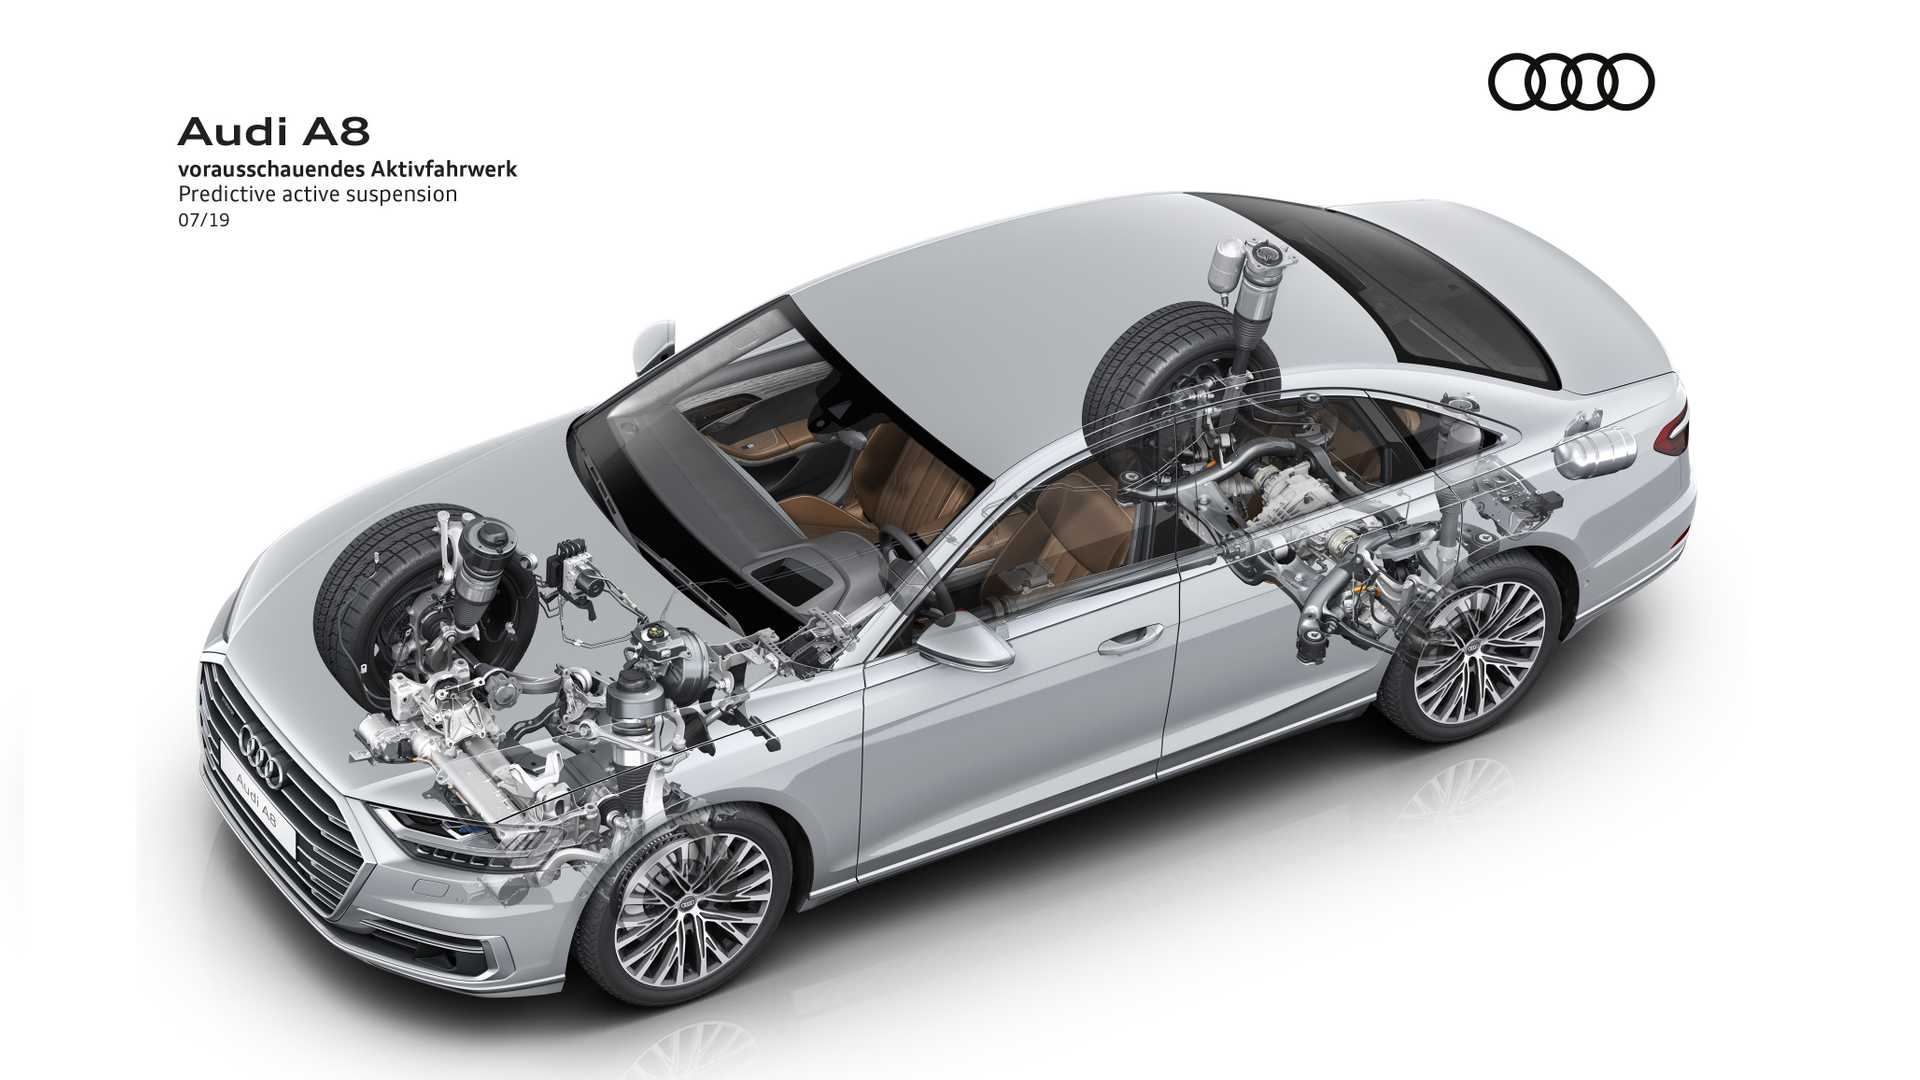 Audi-A8-with-predictive-active-suspension-2